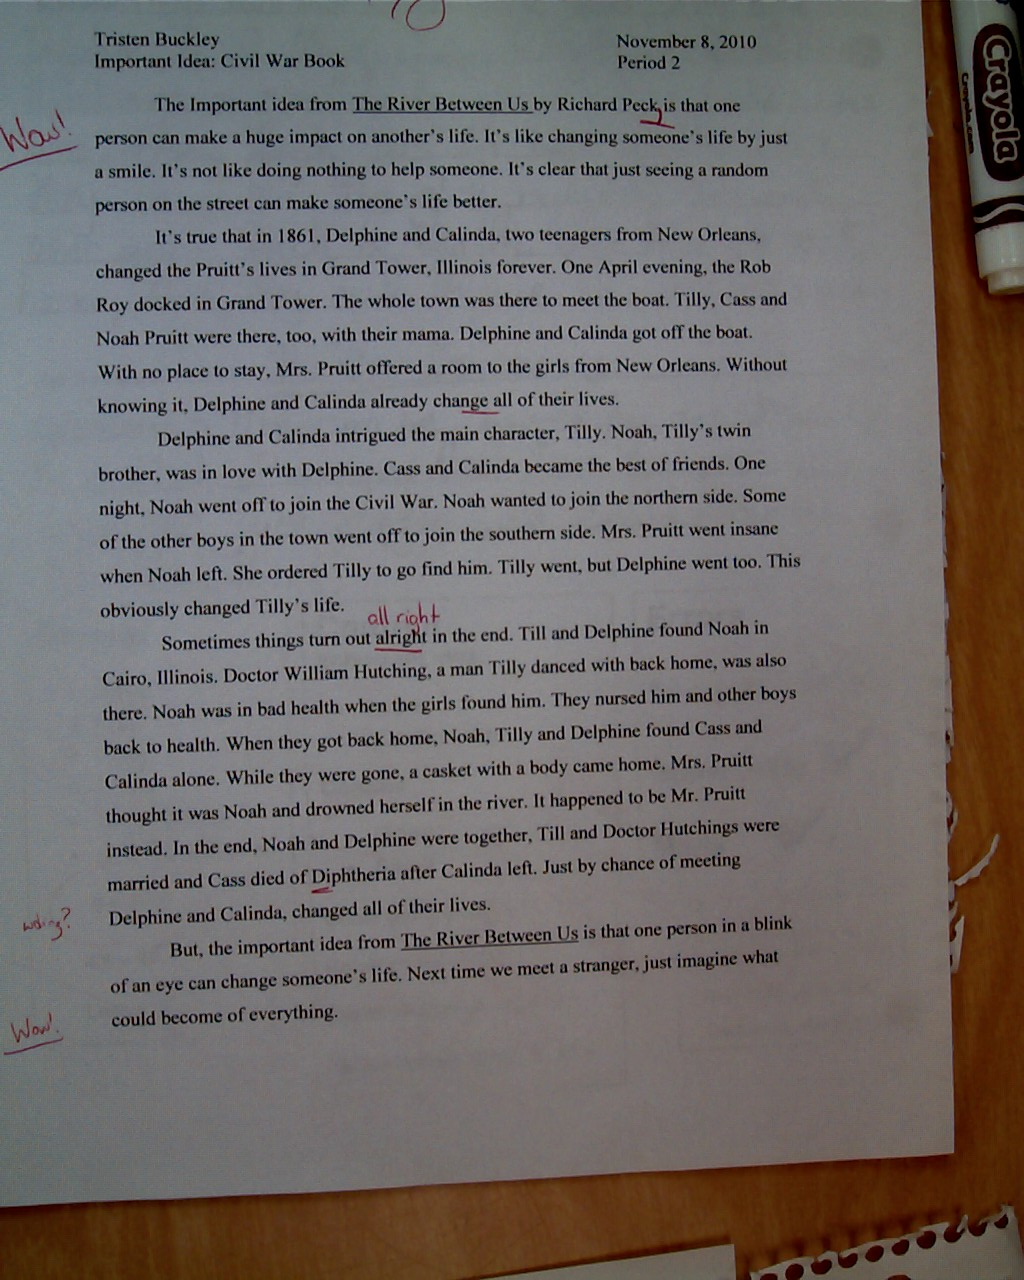 Essay on experience of a flood victim